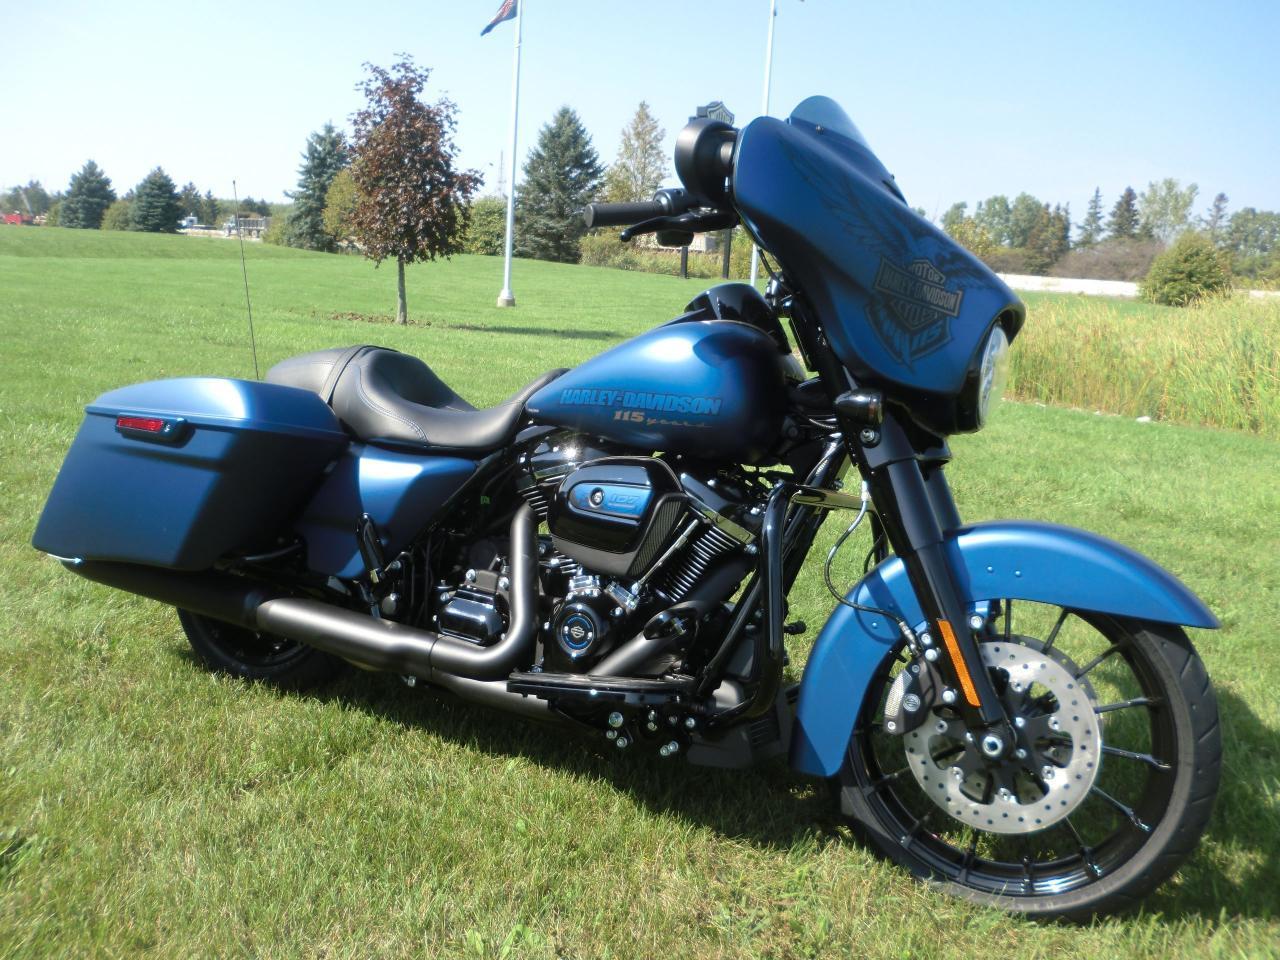 New 2018 Harley Davidson Street Glide Flhxs Anx 115th